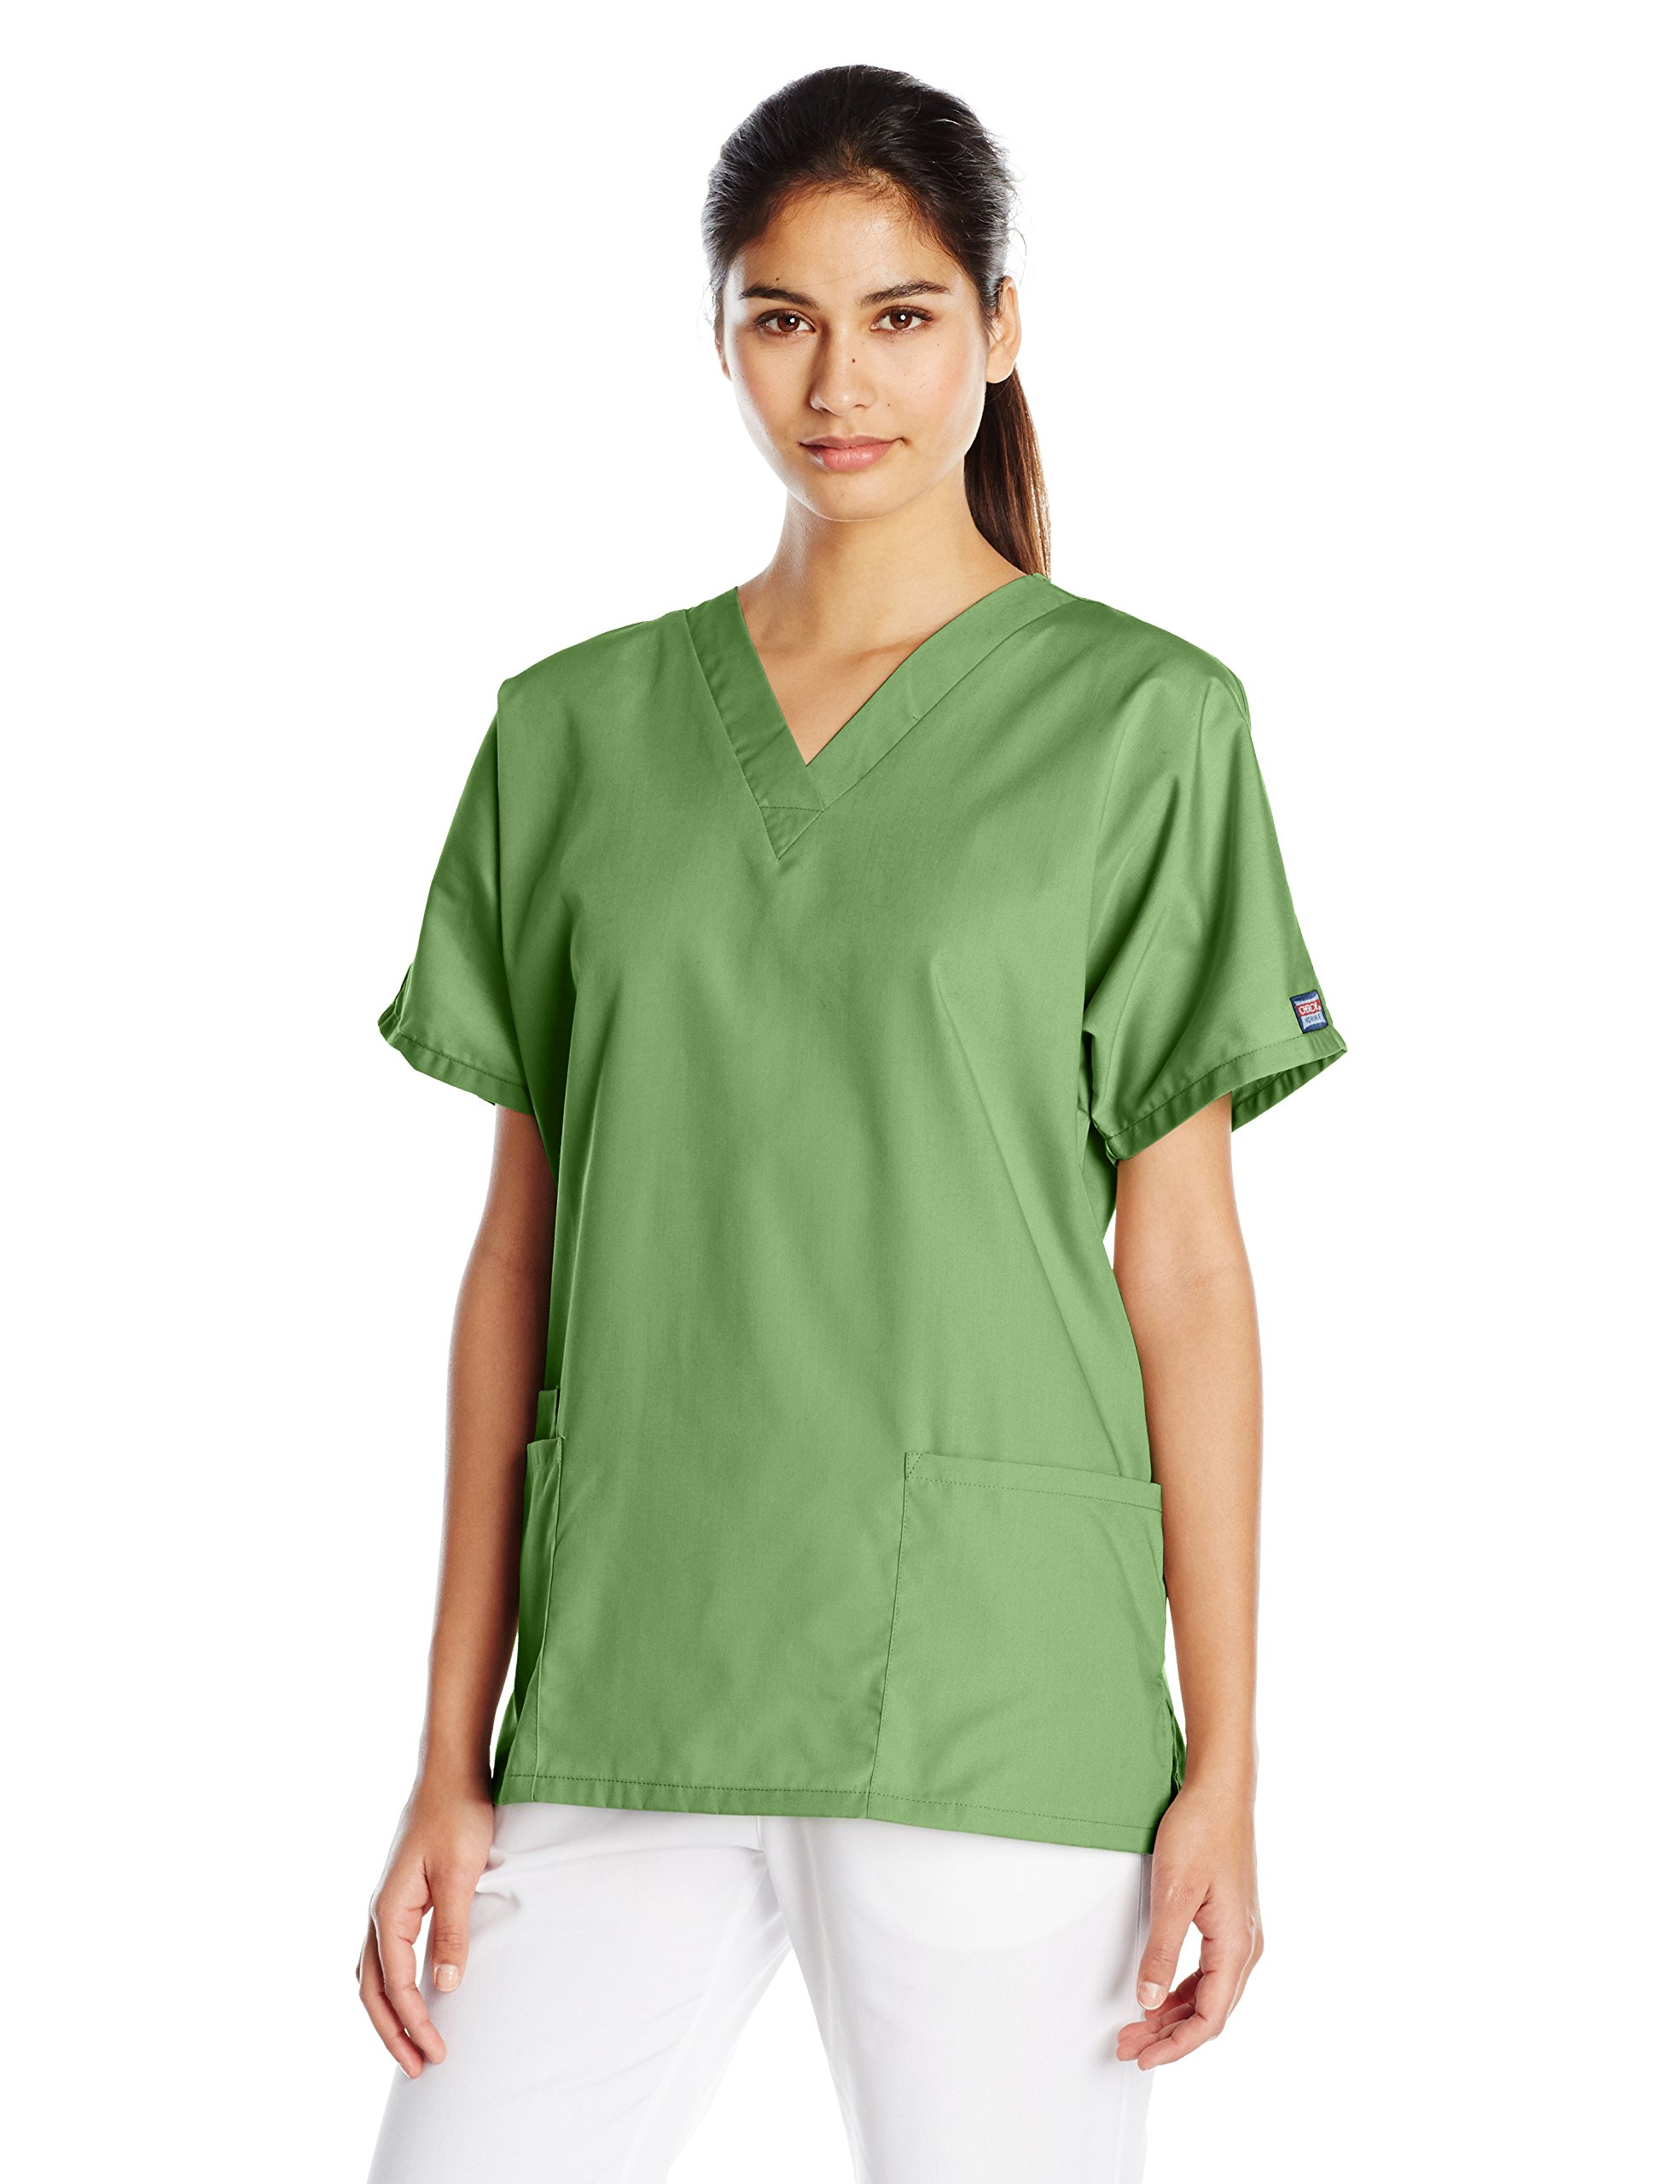 Cherokee Women's V Neck Scrubs Shirt, Aloe, X-Large by Cherokee